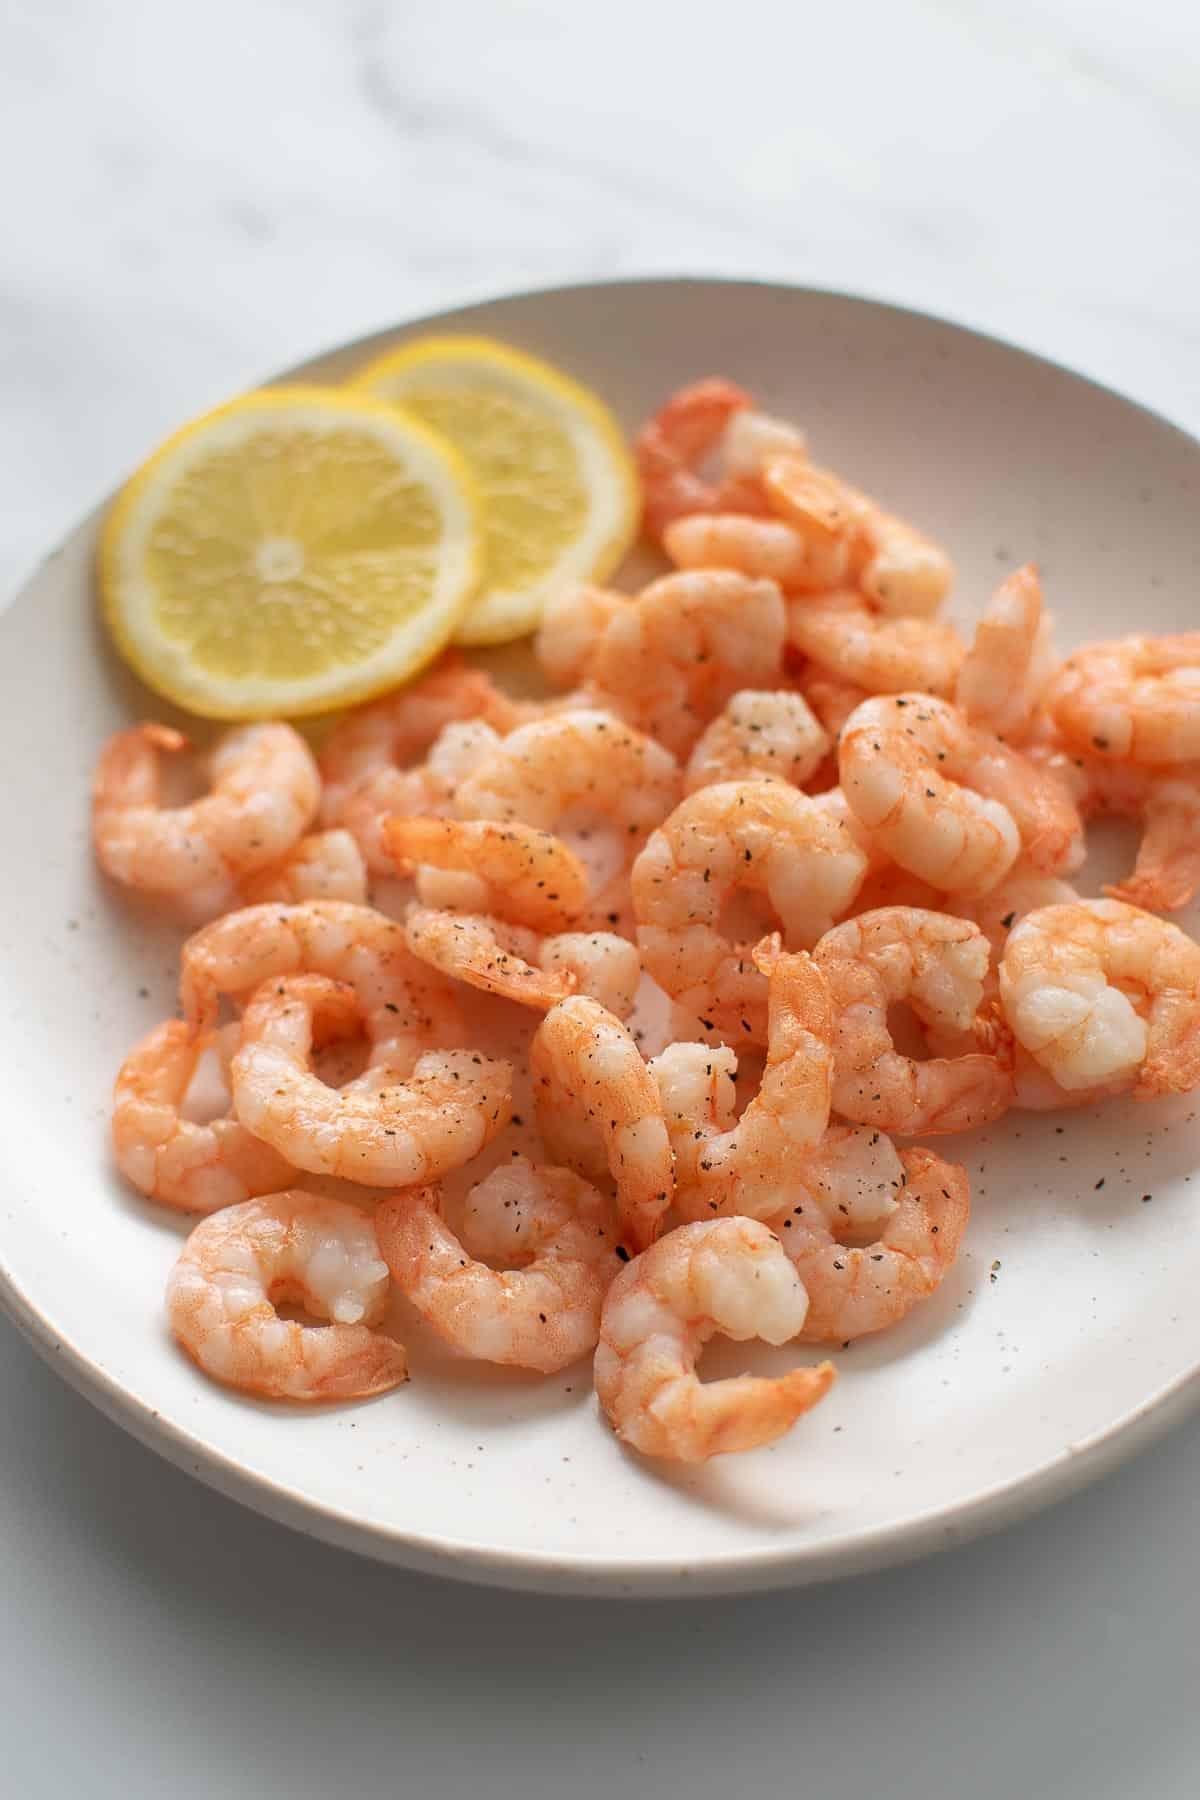 Air fried shrimp with salt, pepper and lemon.